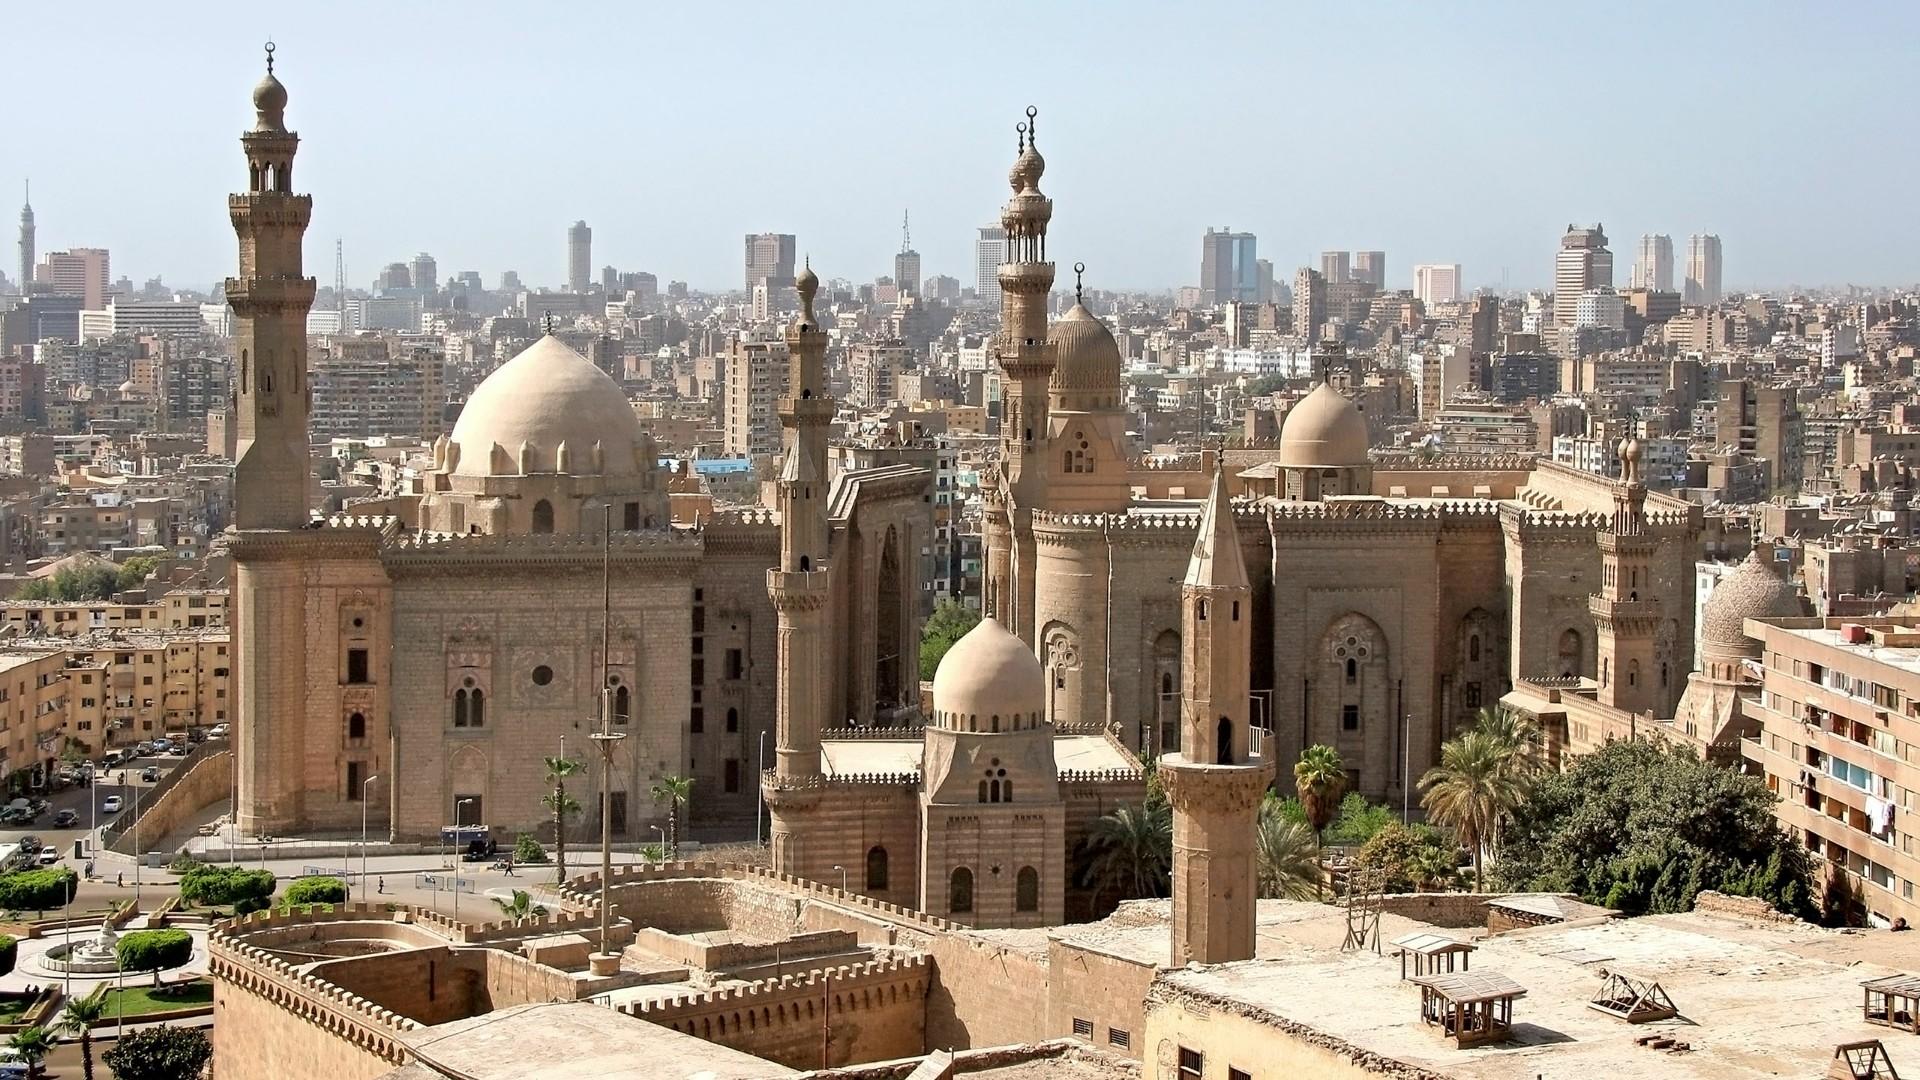 Mosque-Madrassa of Sultan Hassan wallpaper